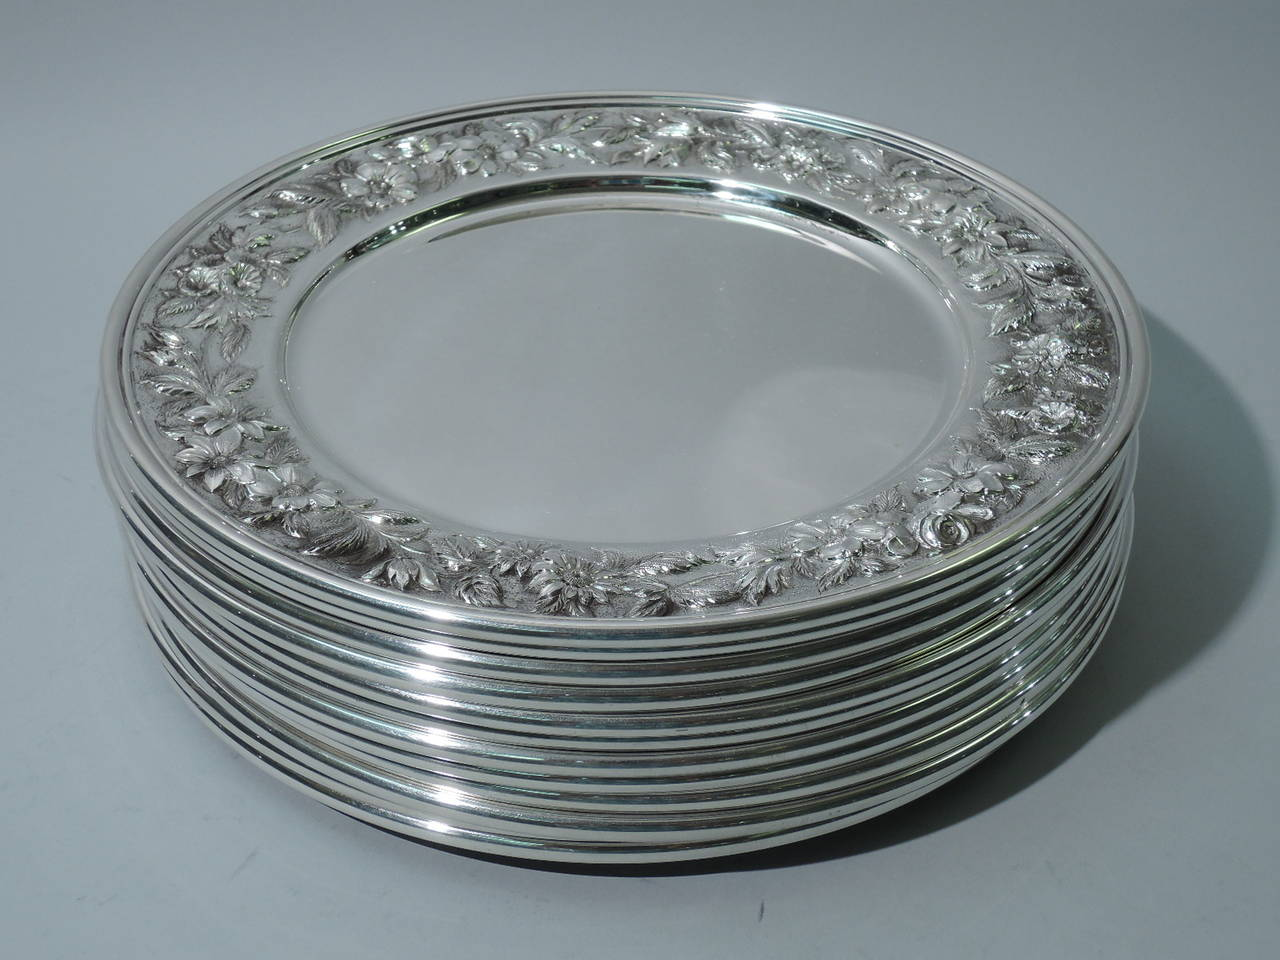 North American Kirk Sterling Silver Dinner Plates circa 1940 BI760 For Sale & Kirk Sterling Silver Dinner Plates circa 1940 BI760 at 1stdibs